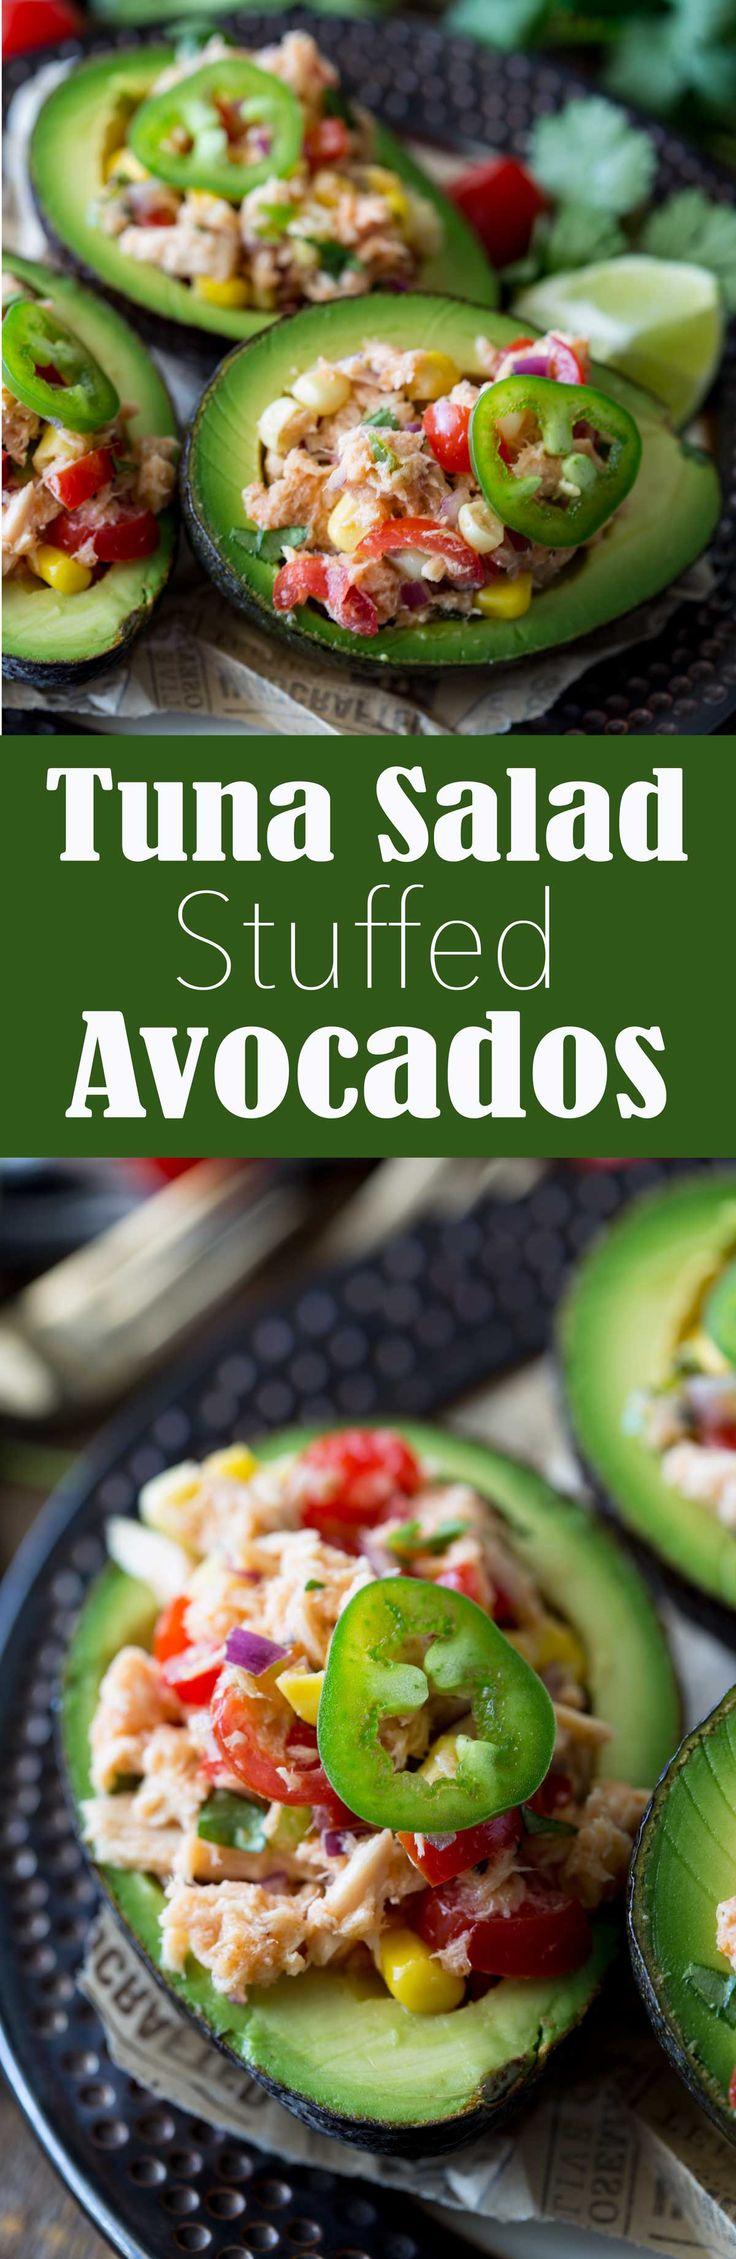 Stuffed avocado, Tuna salad and Tex mex on Pinterest